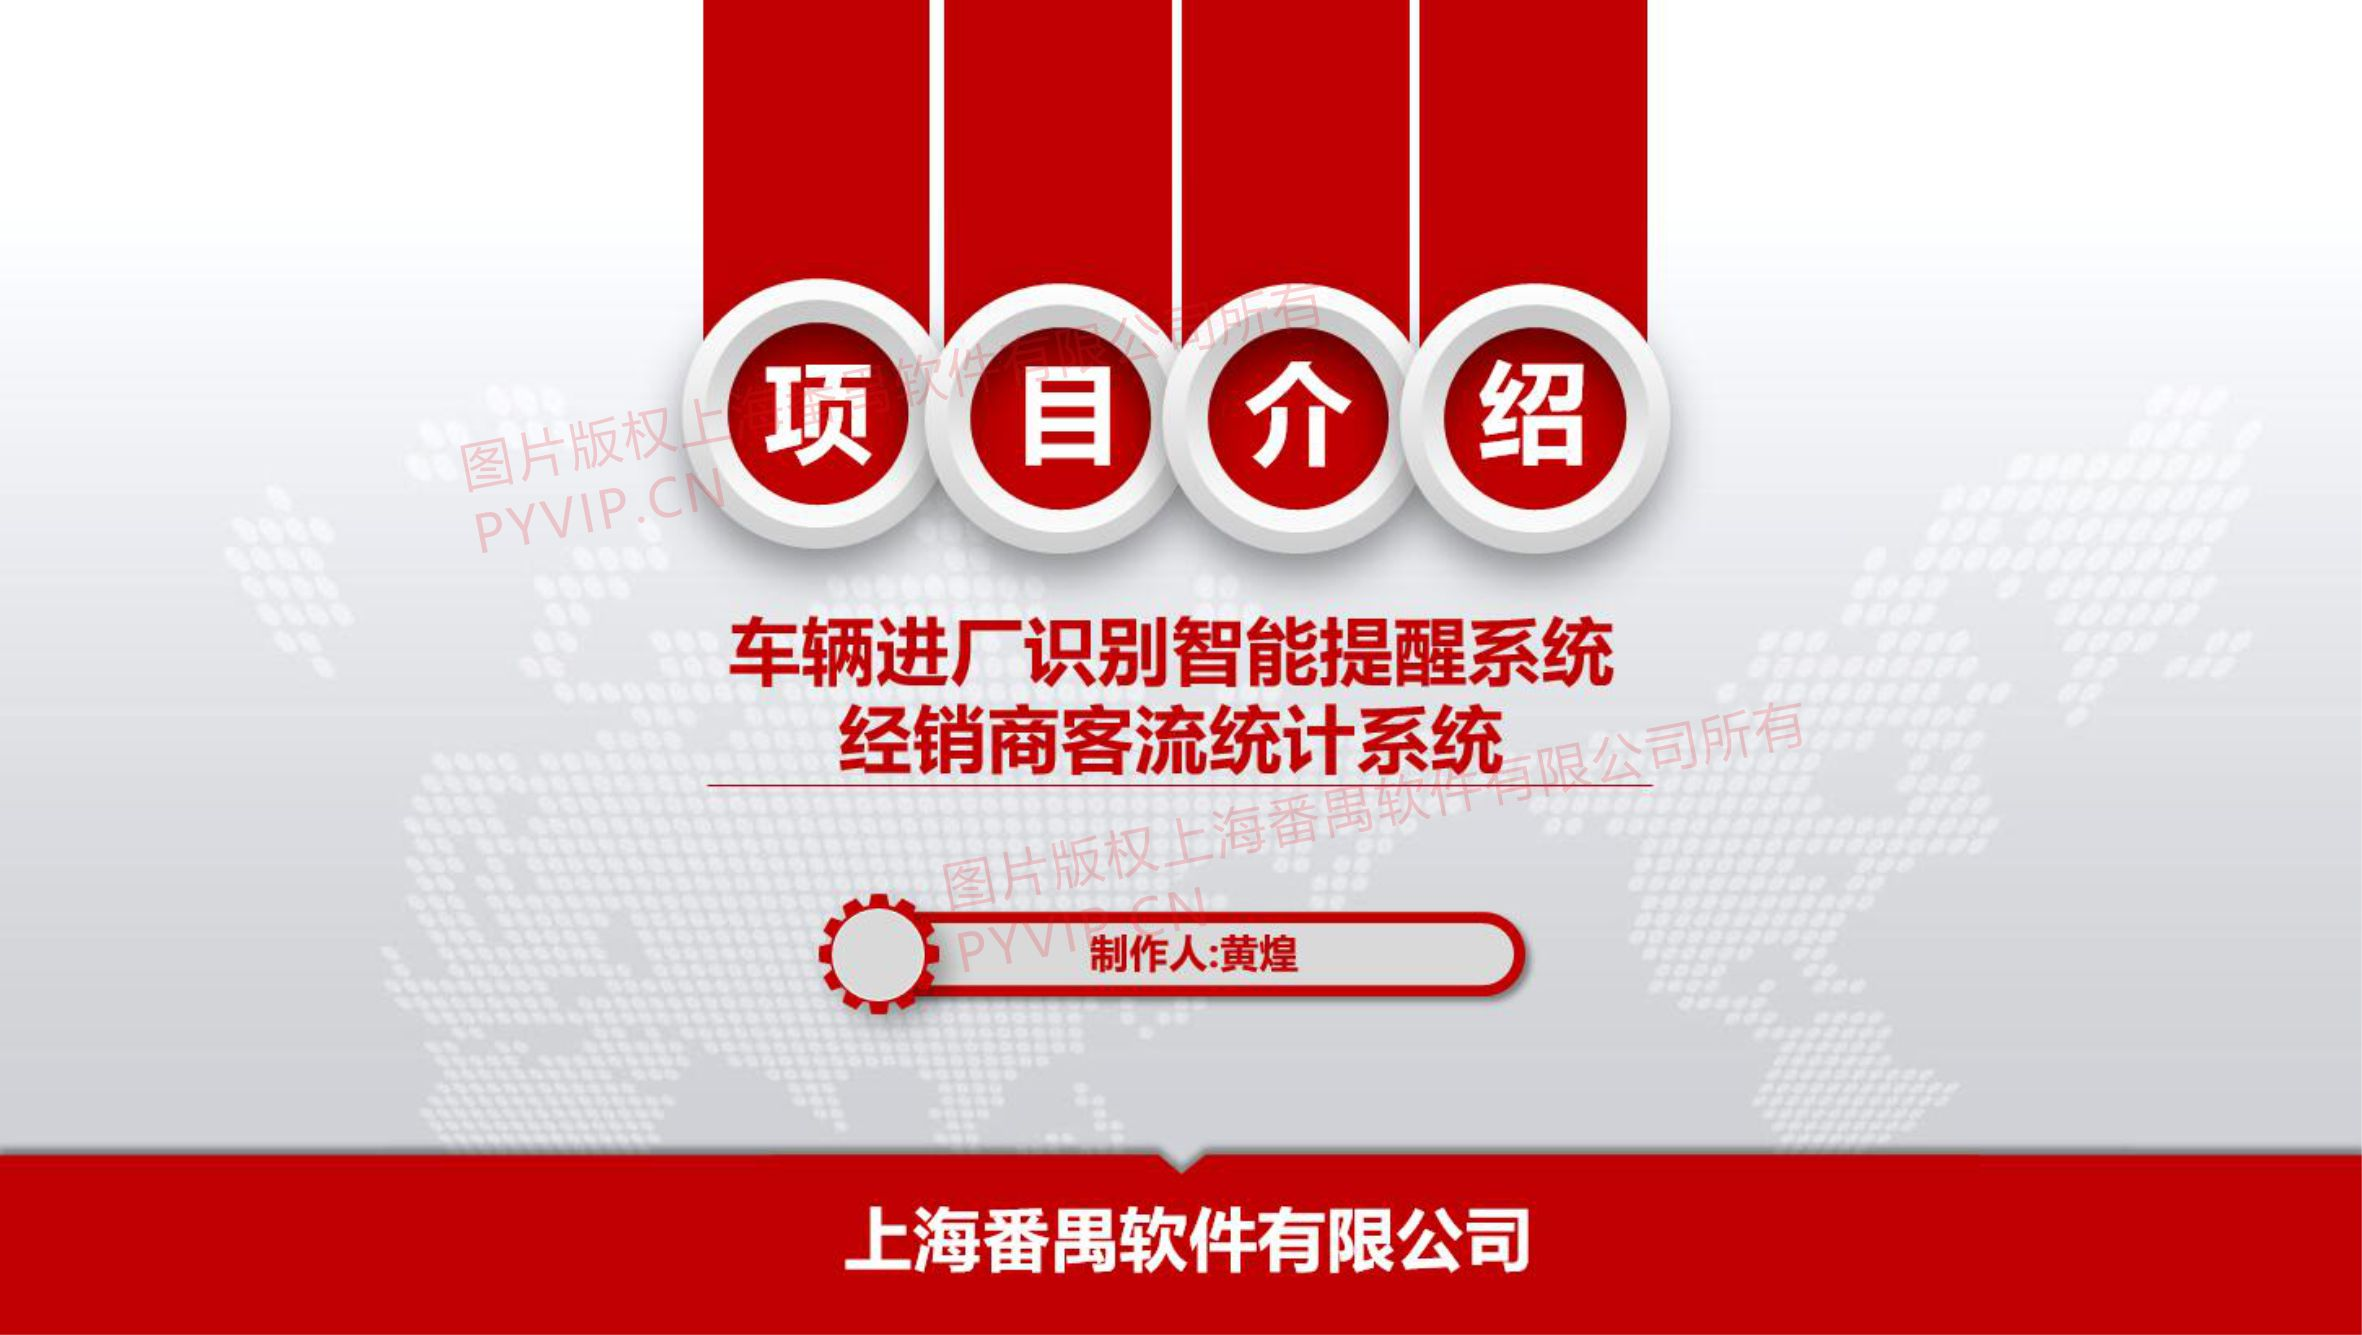 4S店客流统计 4S店车辆管理 4S店业务提醒